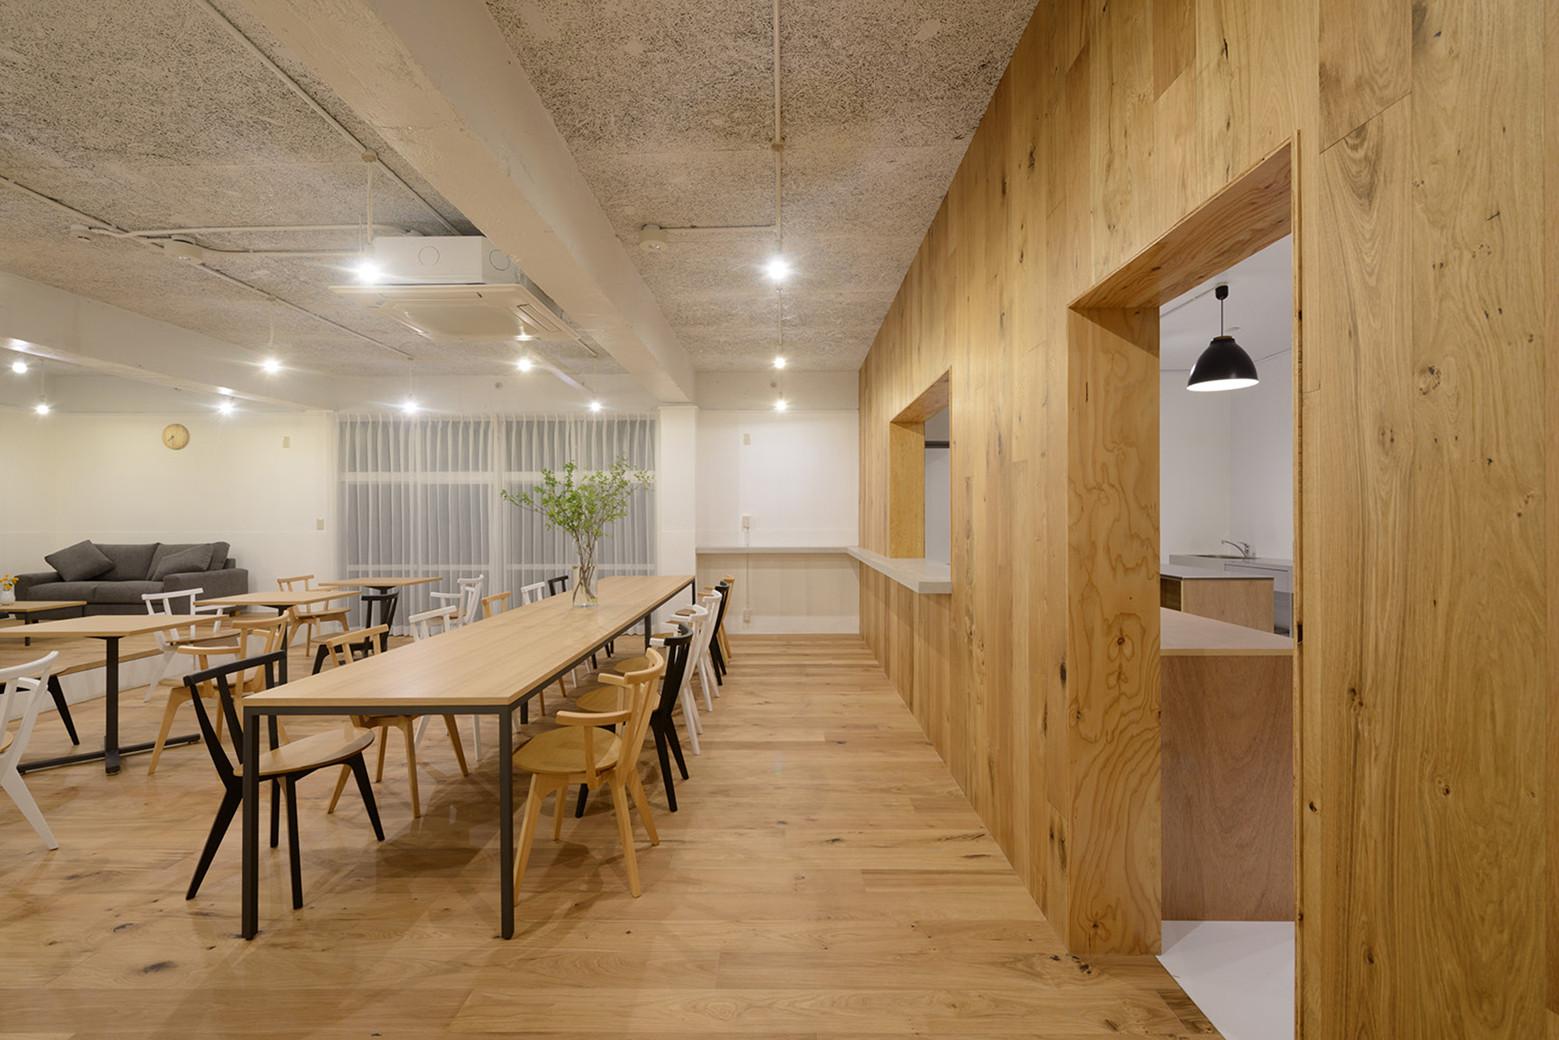 Share House Funabashi / Kasa Architects, © Ikunori Yamamoto